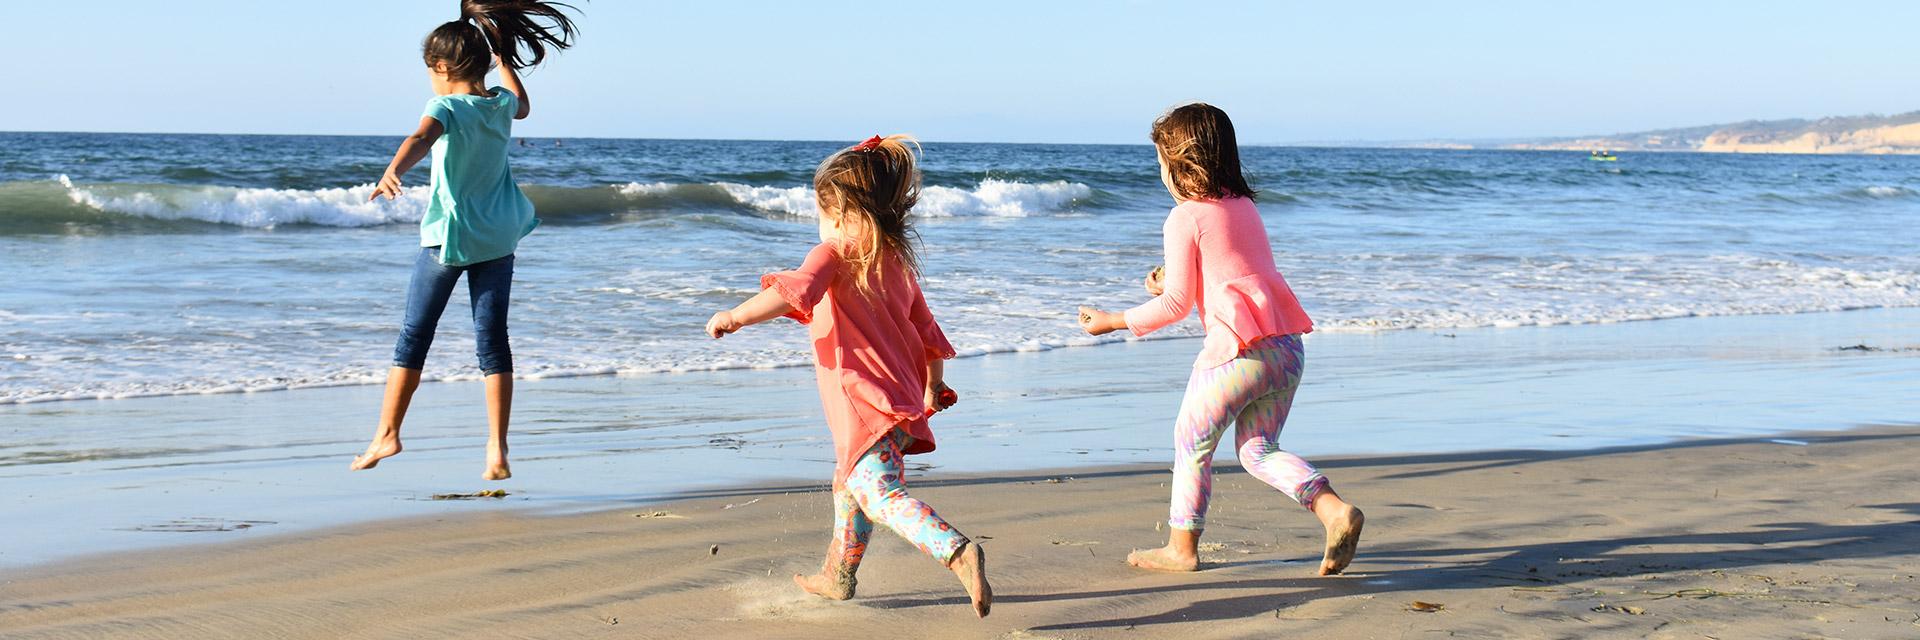 Children's Activities at La Jolla Beach And Tennis Club, California